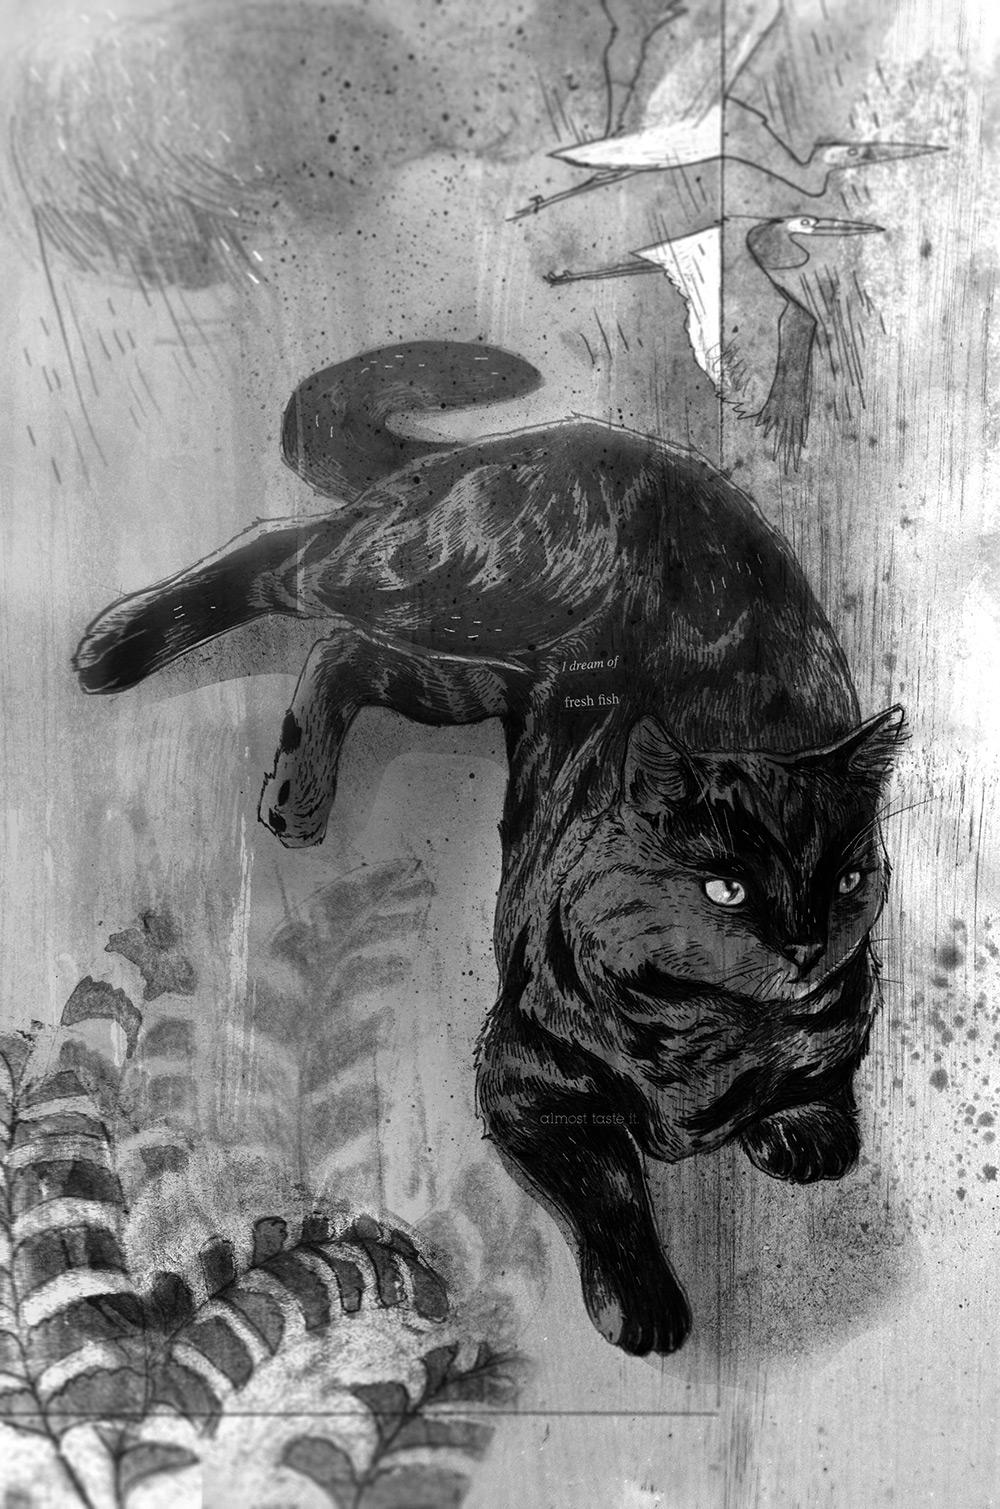 The cat and the egrets: illustration ©Prabha Mallya and AlephBookCompany.